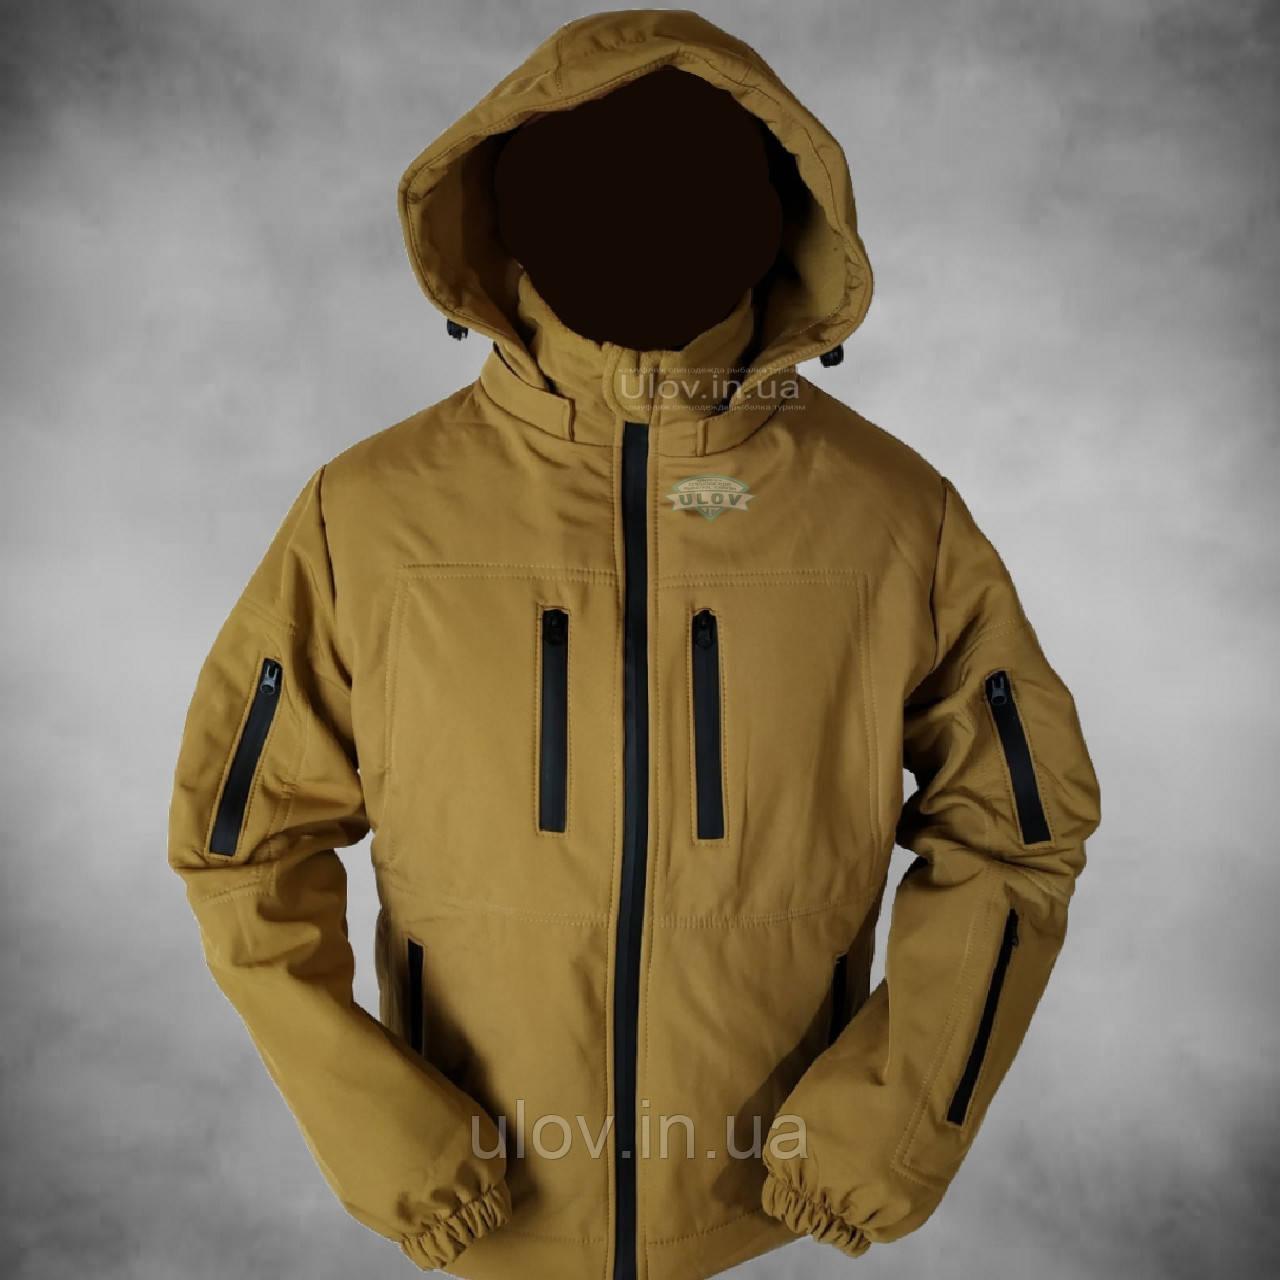 Куртка демісезонна штормова Soft Shell (койот)